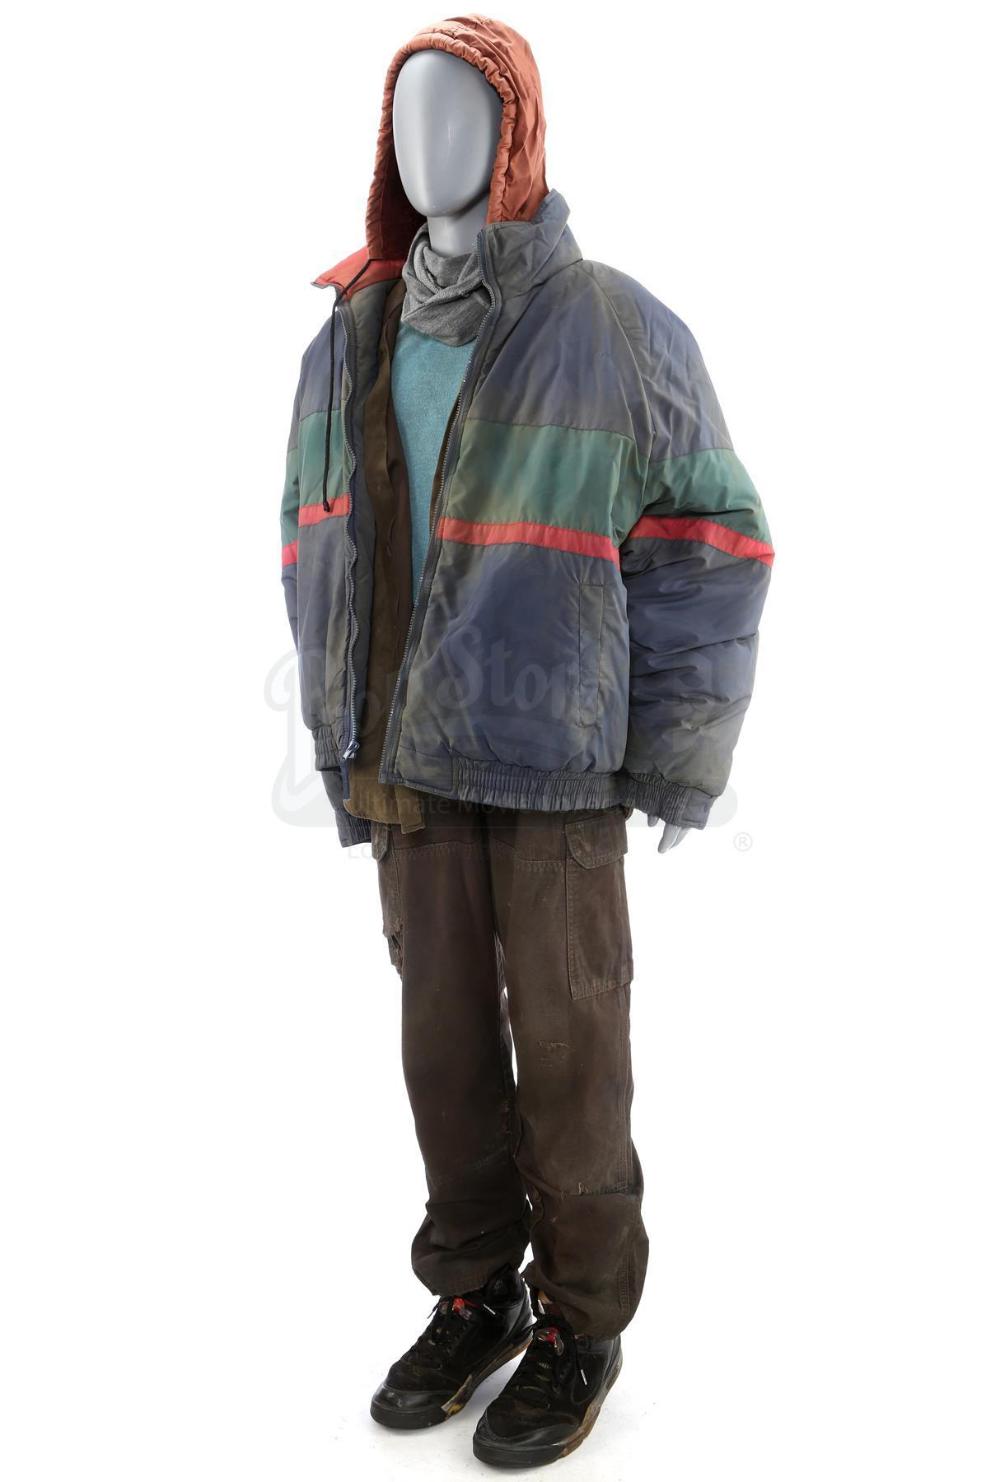 Lot 414 John Wick Chapter 3 Parabellum Distressed Bowery Homeless Man Stunt Costume Price Estimate In 2021 Homeless Clothing Homeless Man Homeless